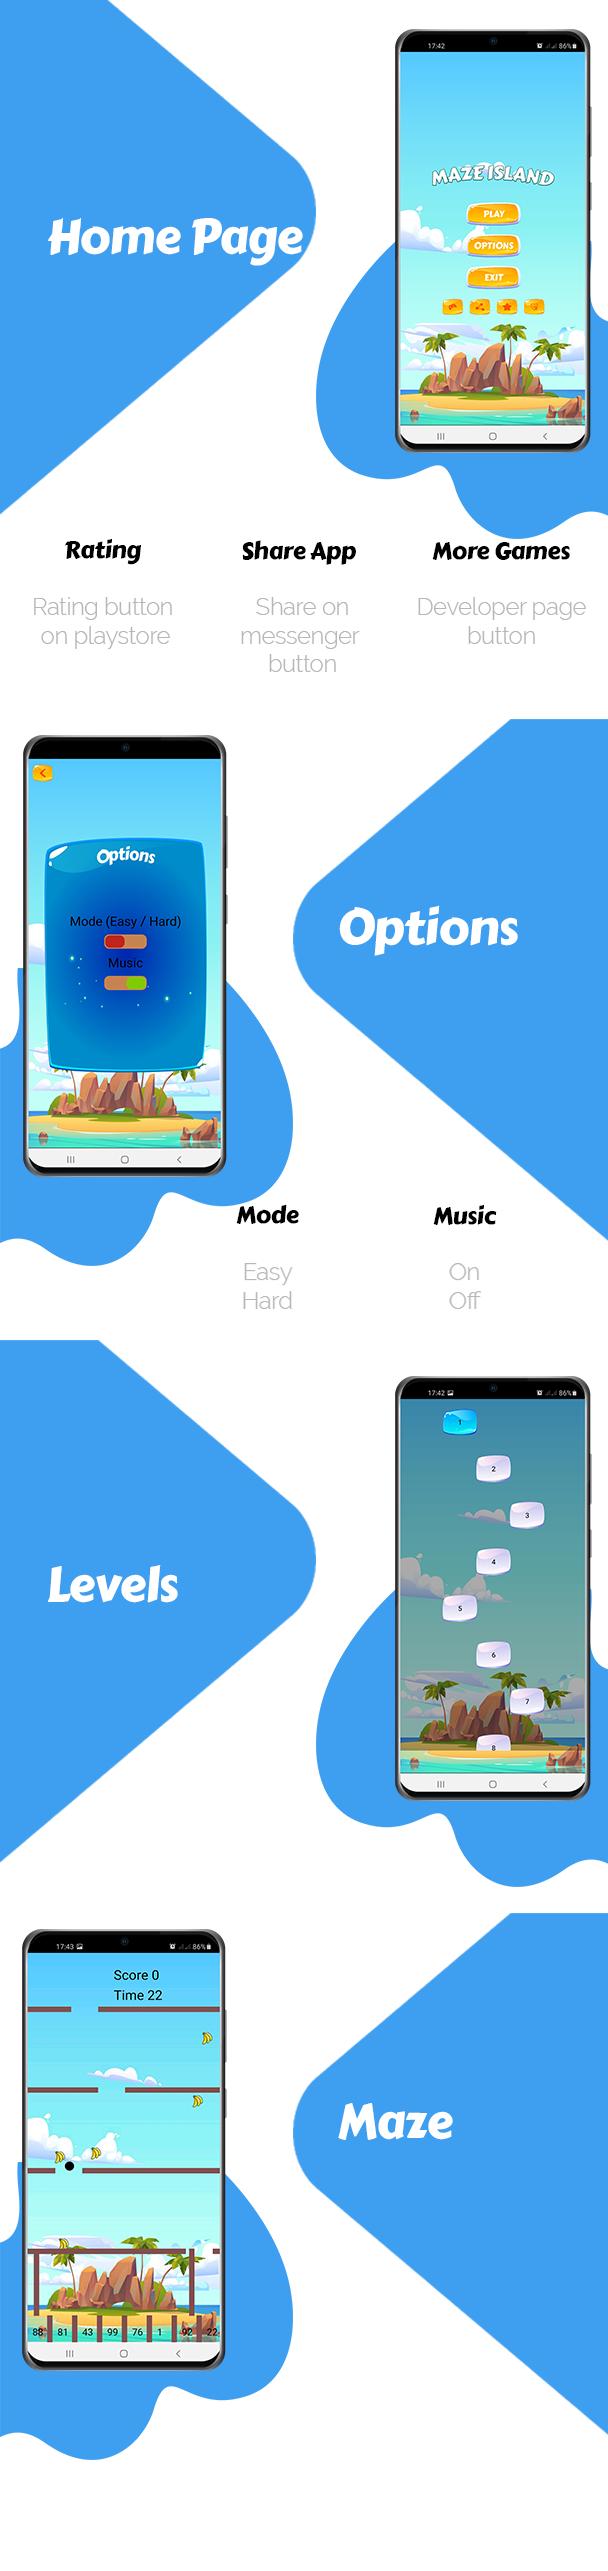 Maze Island Game For Kids - 1